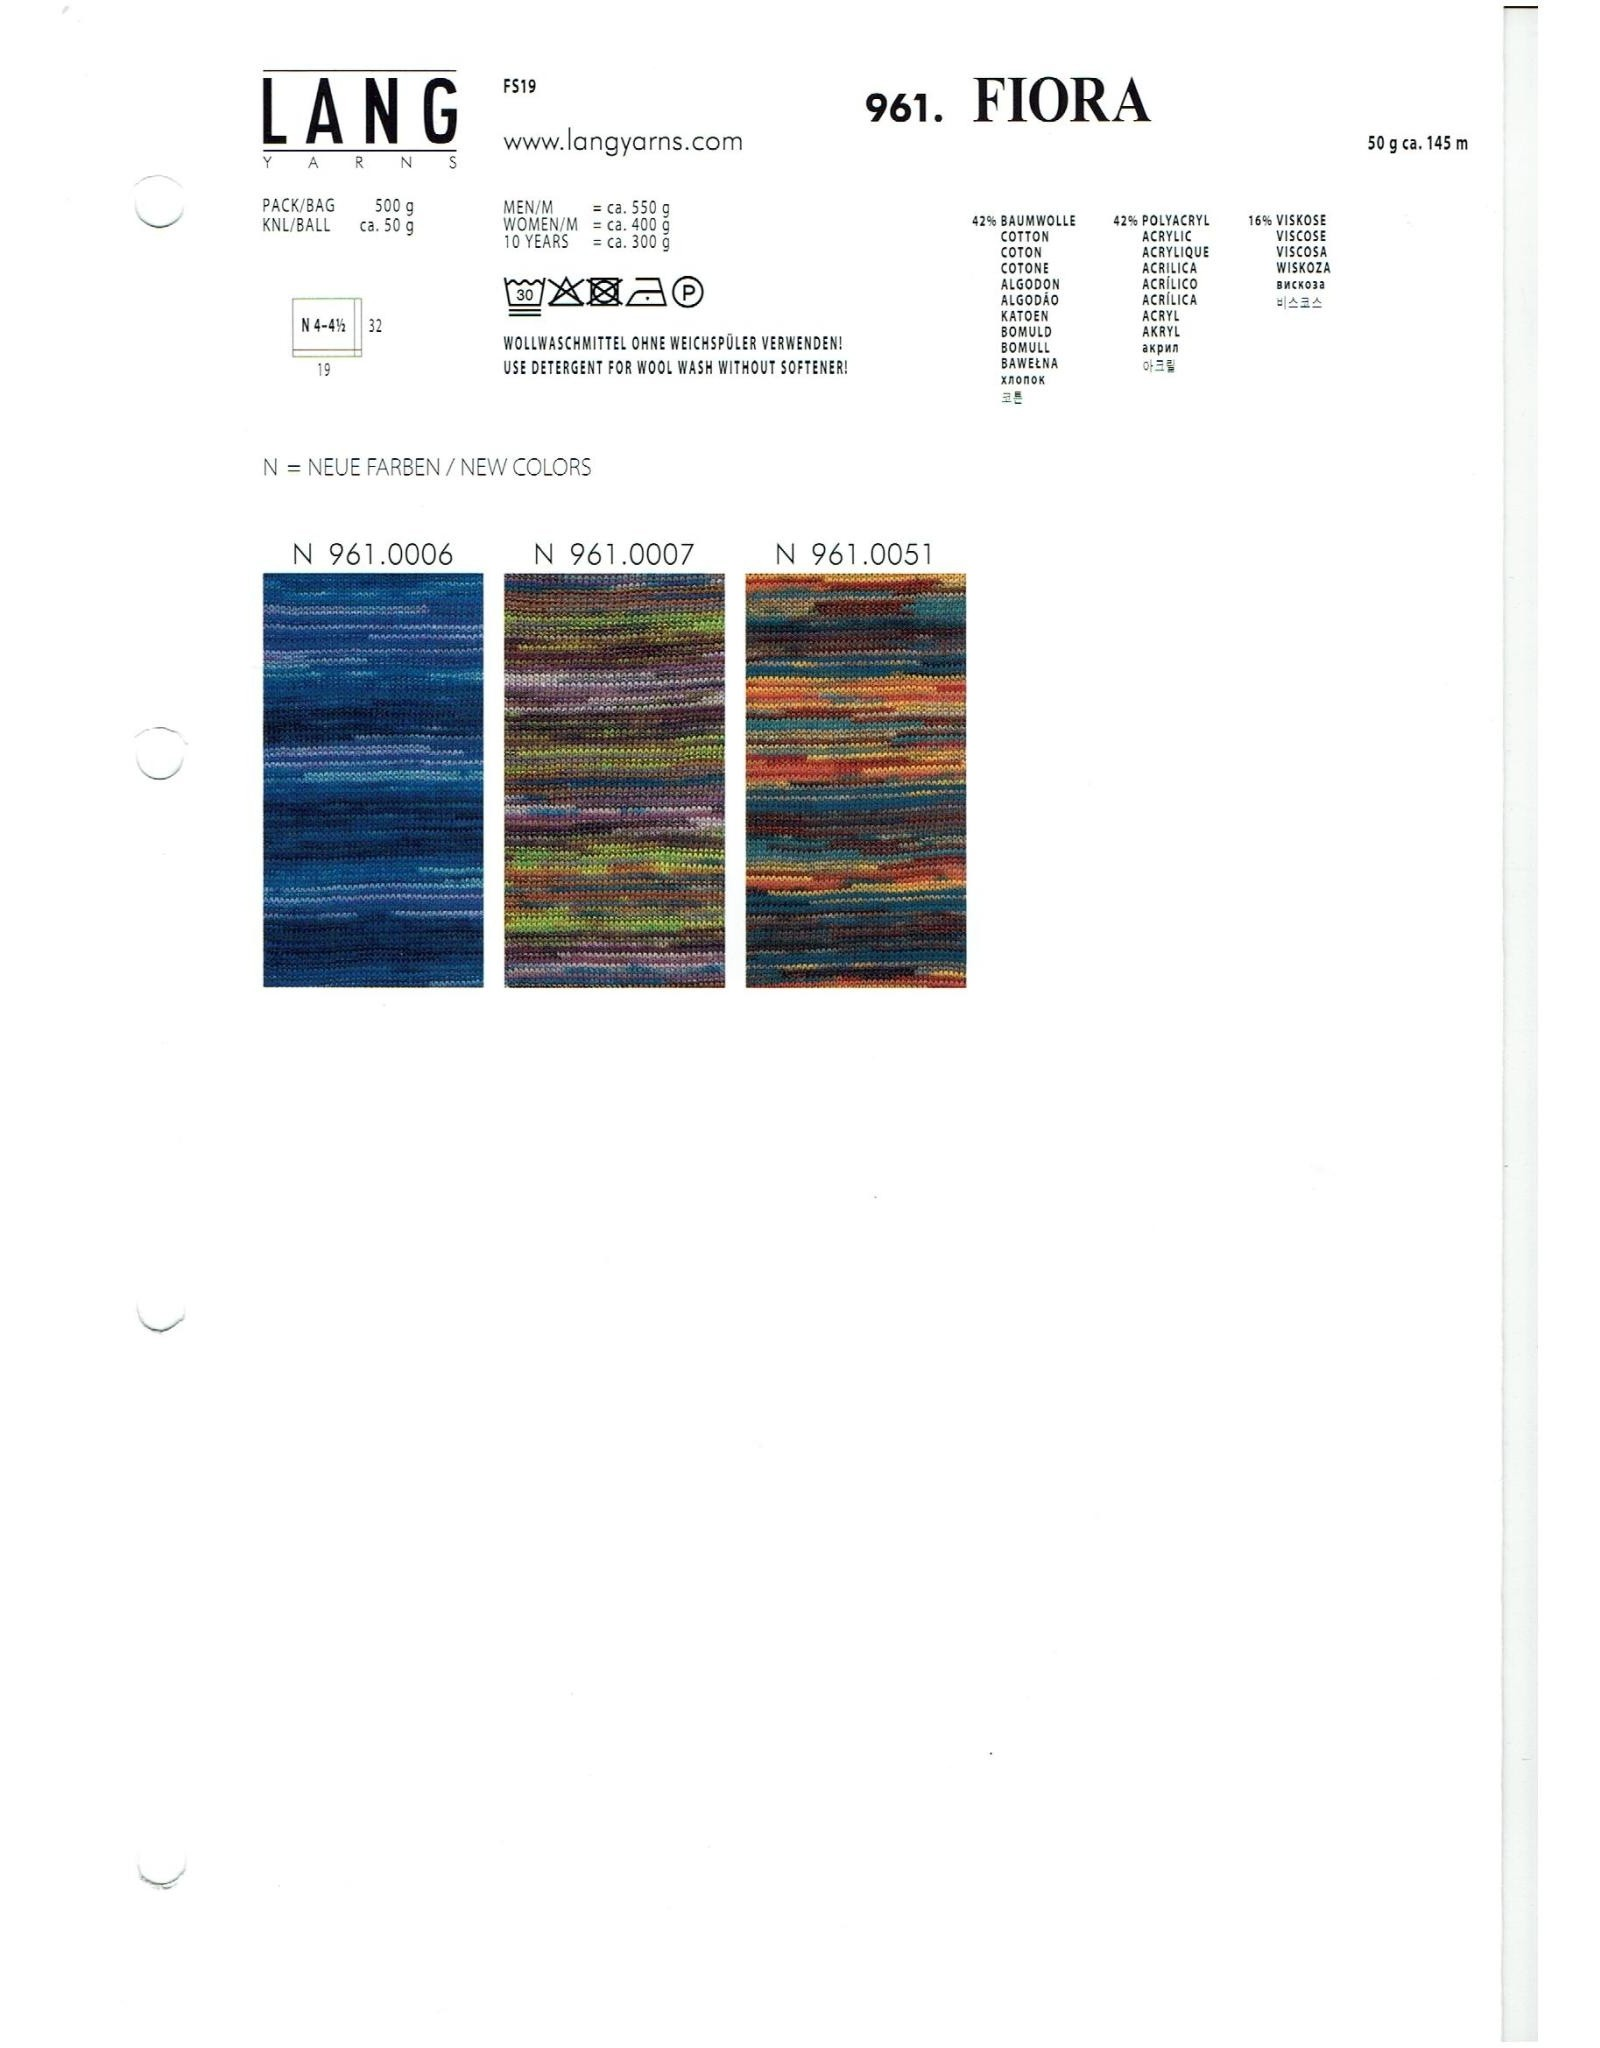 Lang Fiora van Lang Yarns - 146 m - 50 g